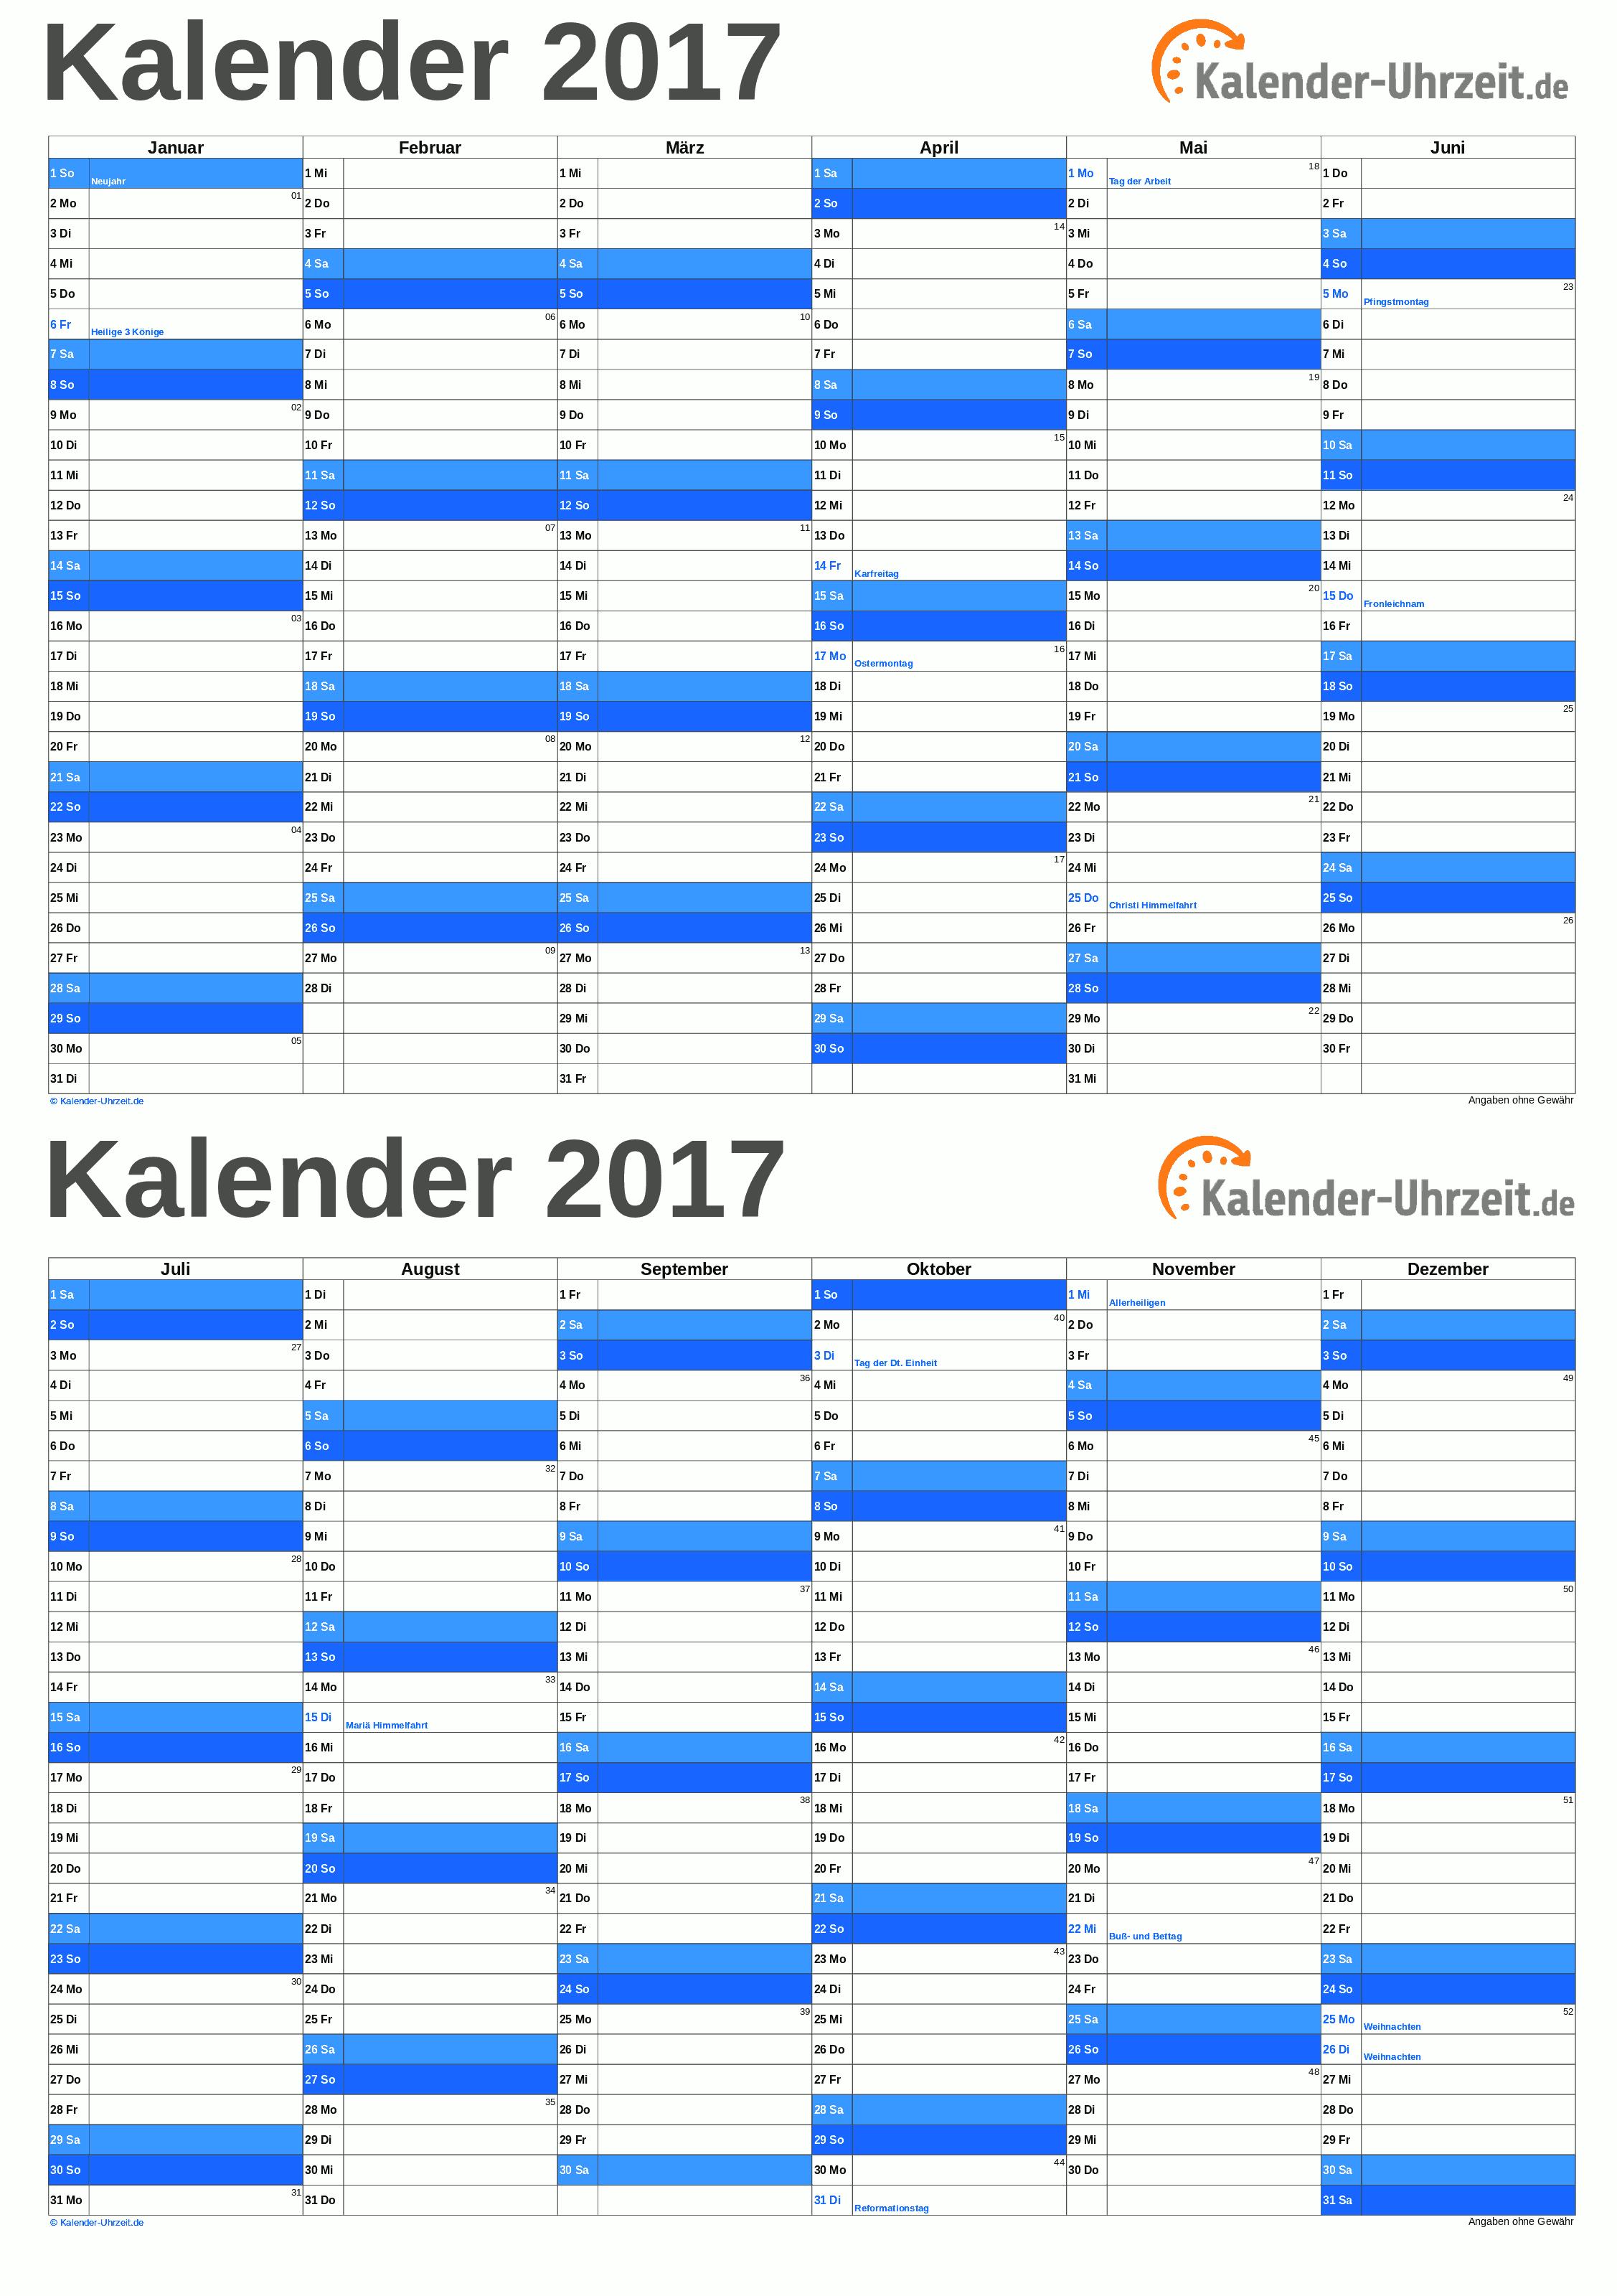 EXCEL-KALENDER 2017 - KOSTENLOS